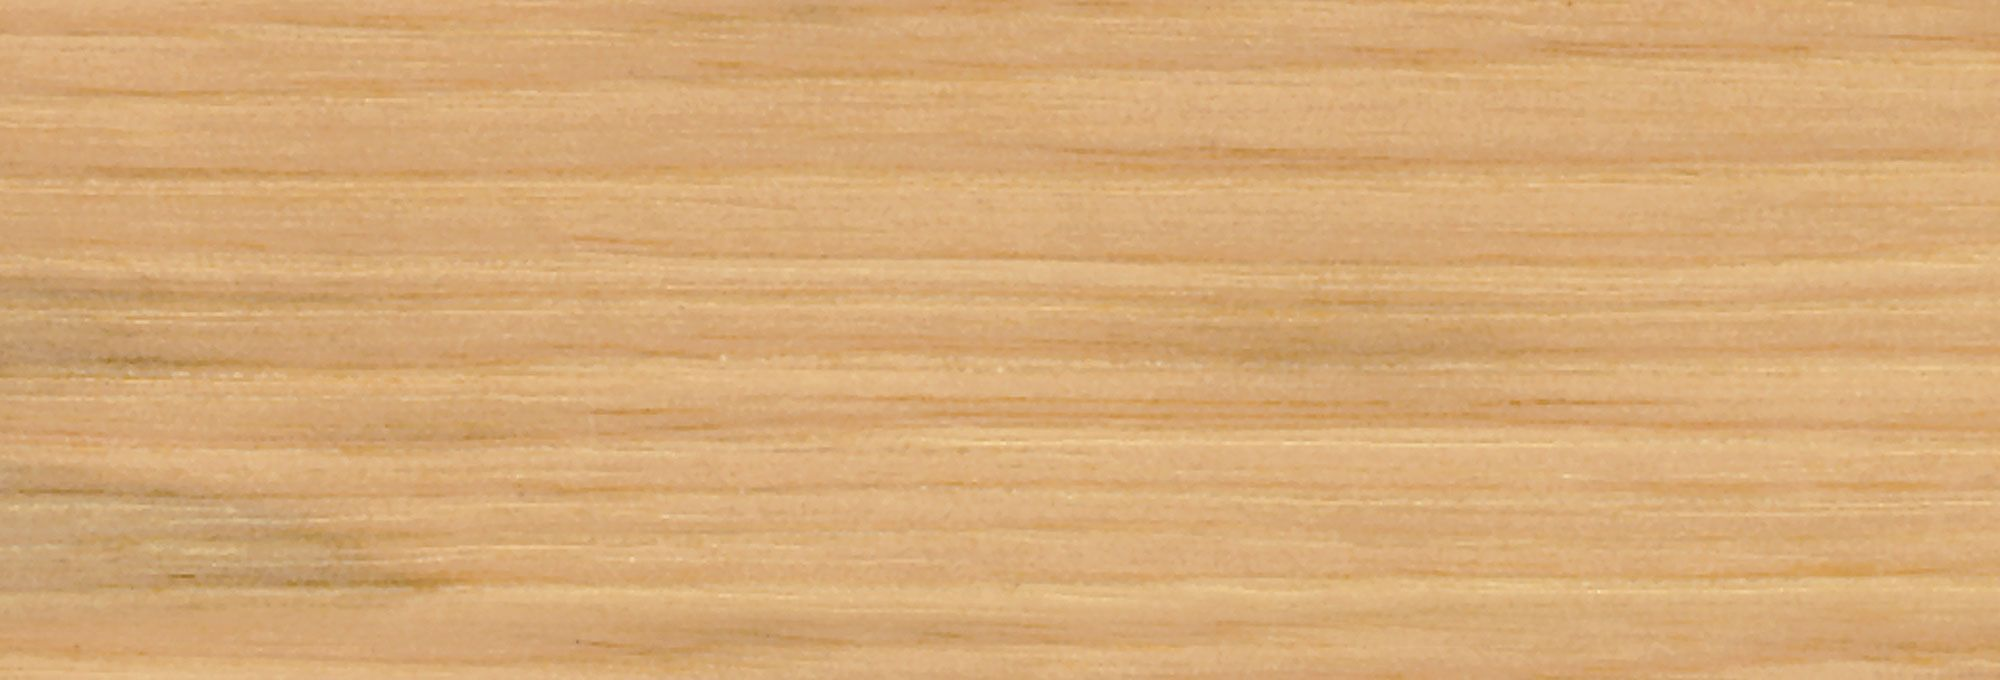 Image result for light wood grain - 130.4KB